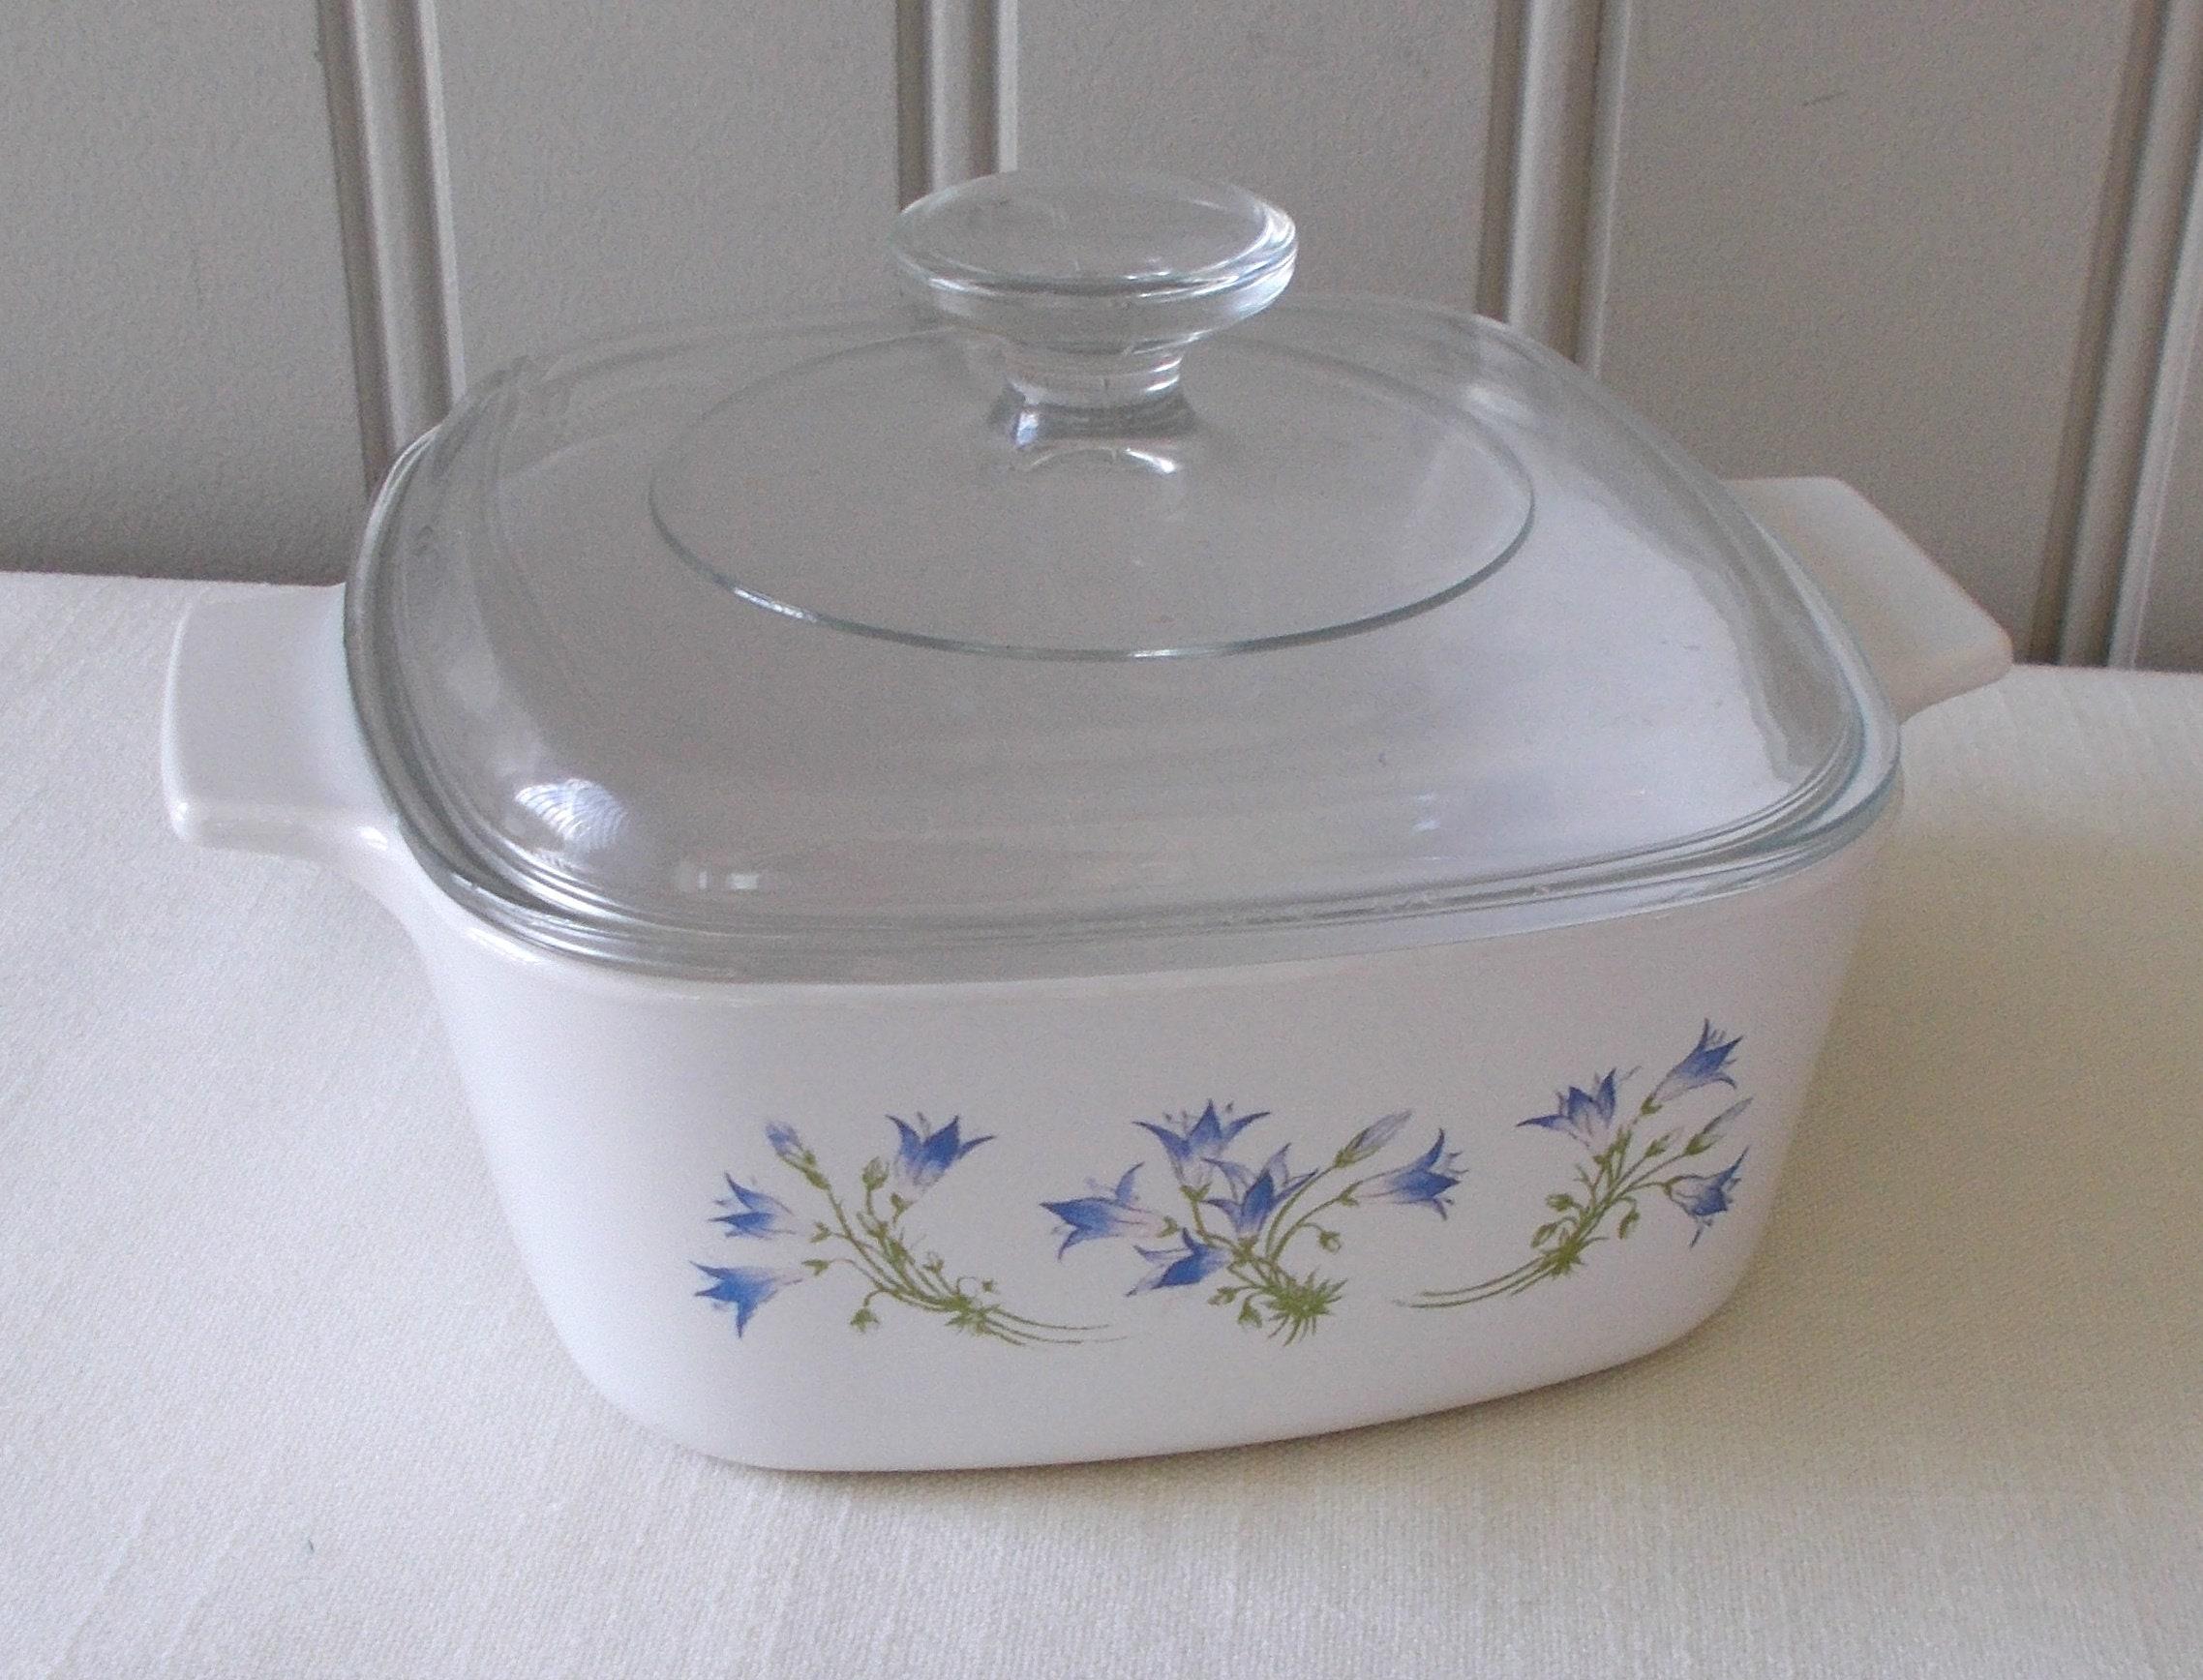 Vintage Corning Ware Casserole Violet Pattern Etsy